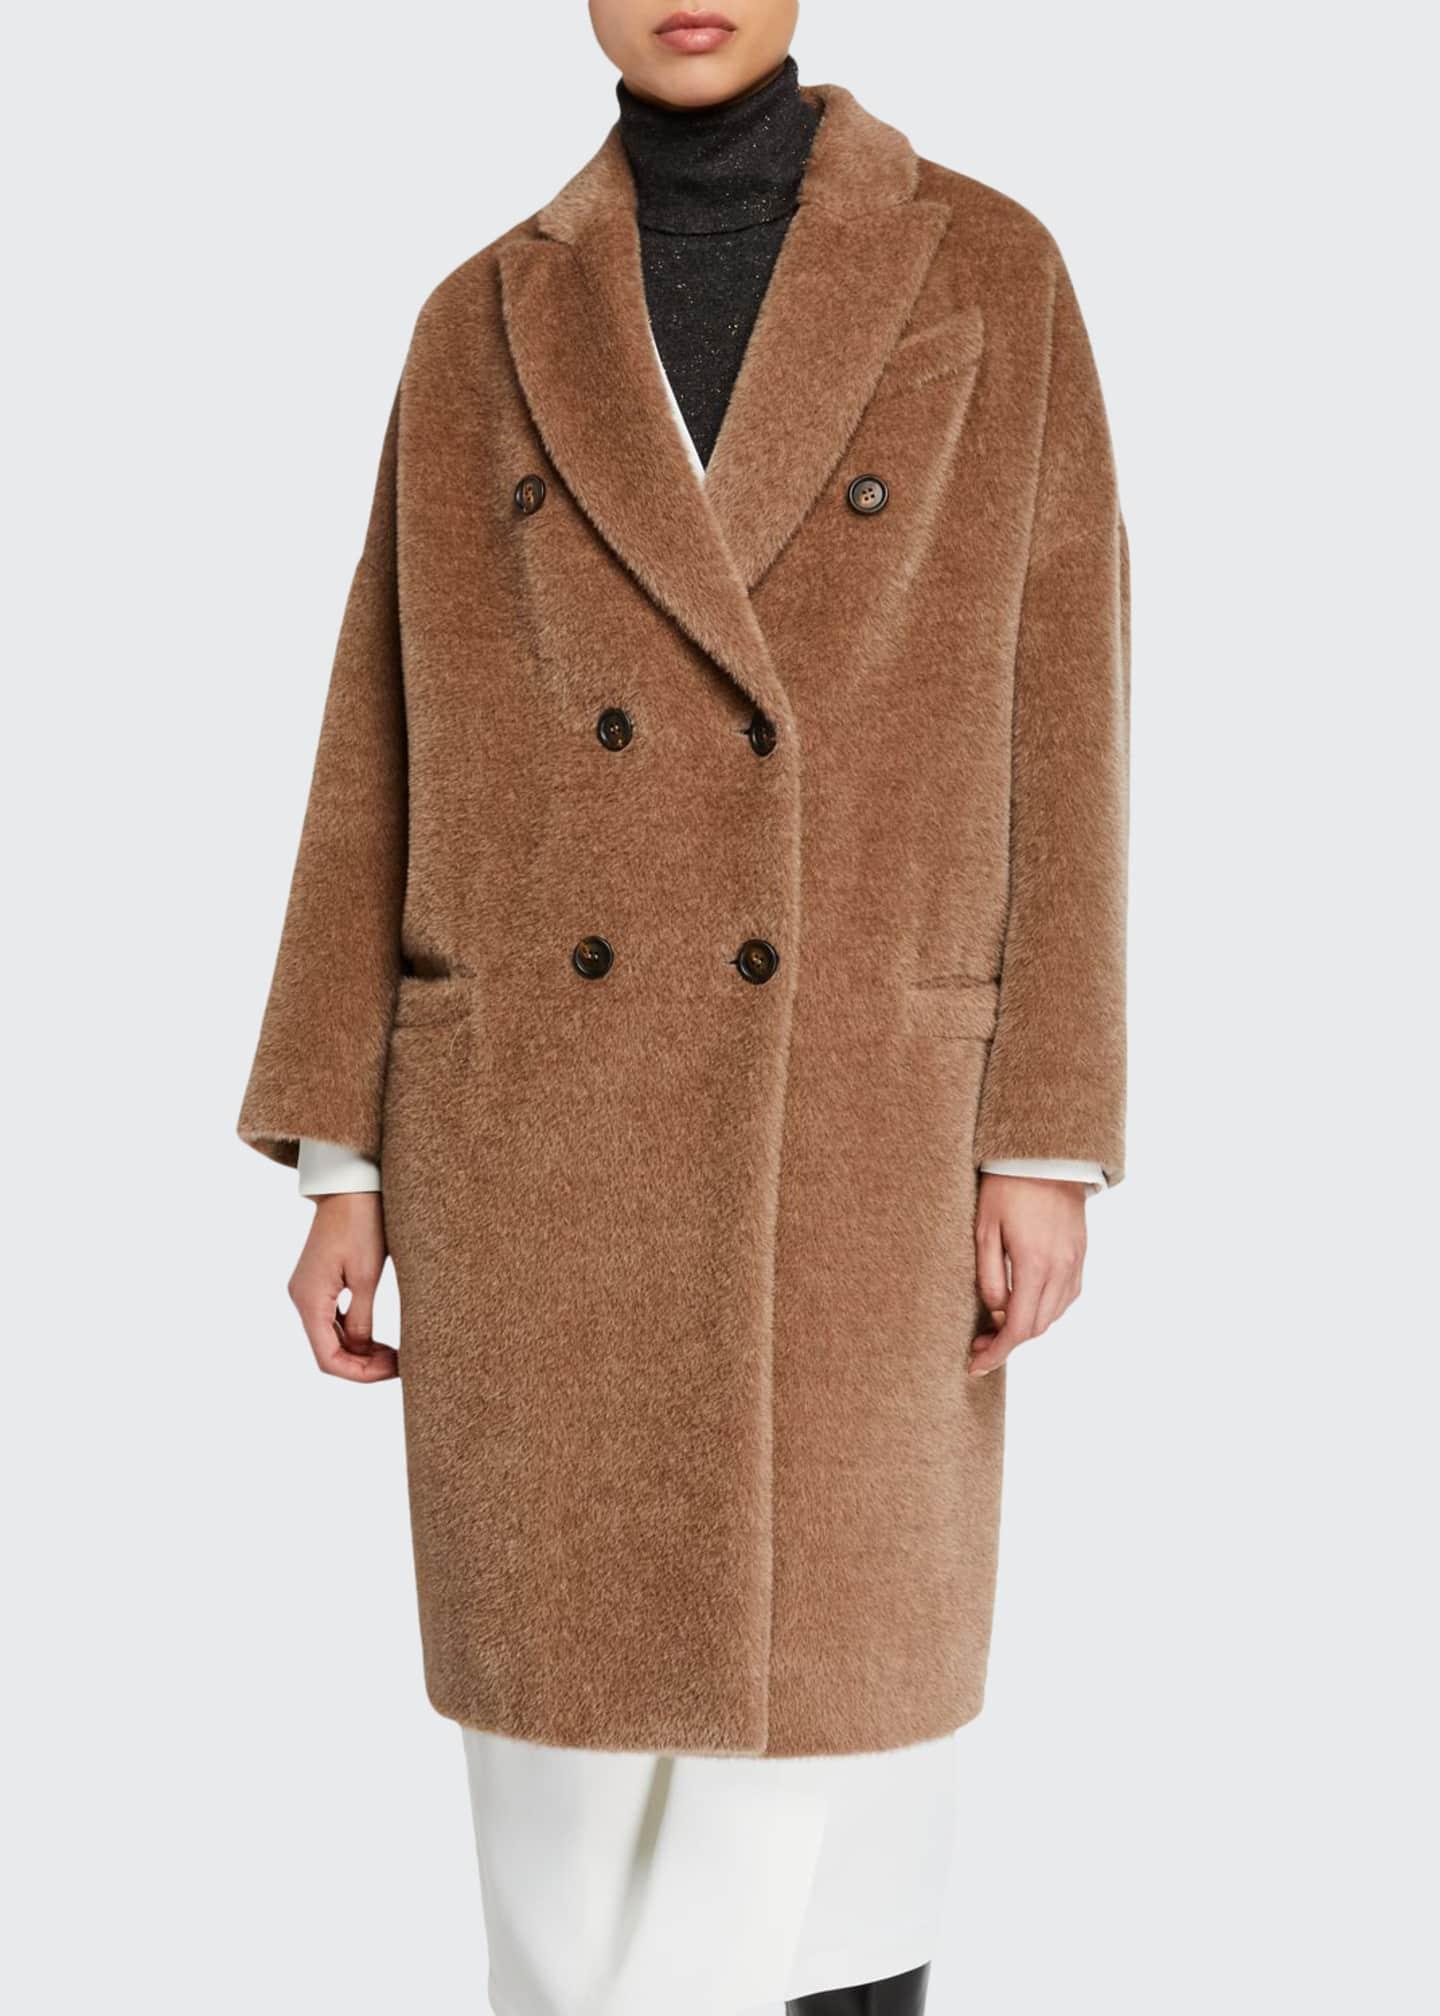 Brunello Cucinelli Alpaca-Wool Double-Breasted Melton Coat